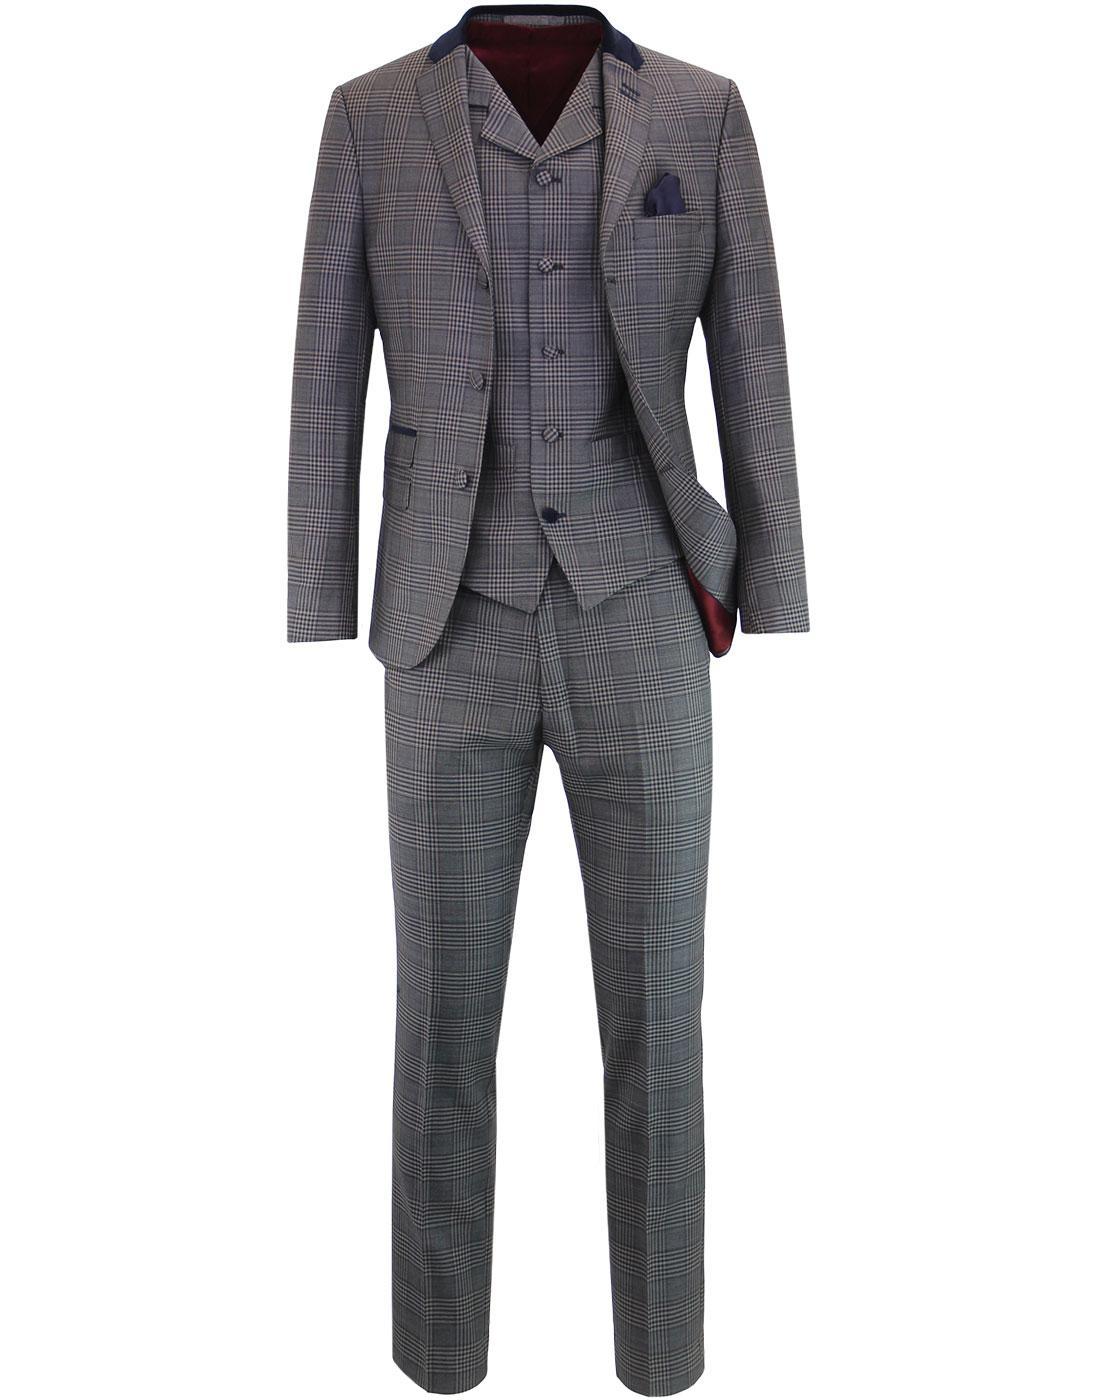 MADCAP ENGLAND POW Check Velvet Collar Mod Suit